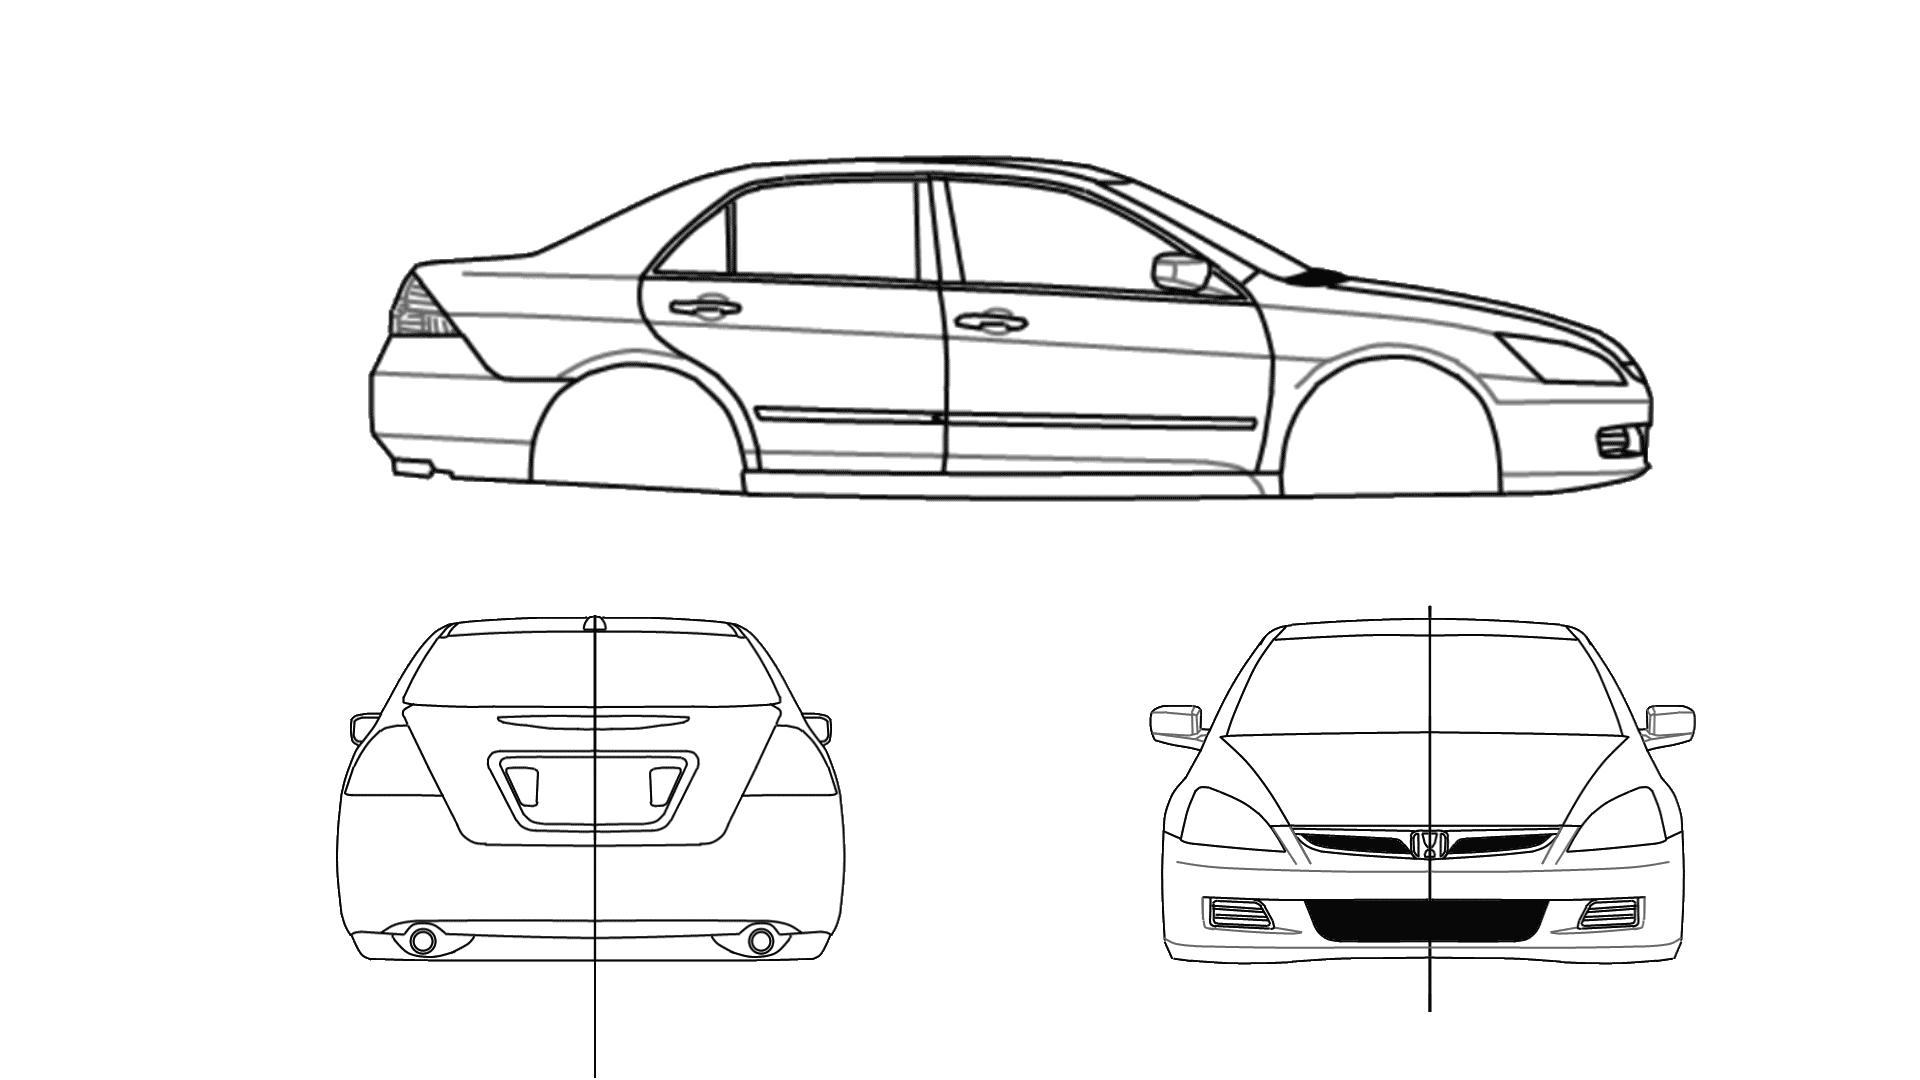 Honda Accord Se 07 V6 Sedan Blueprints Free